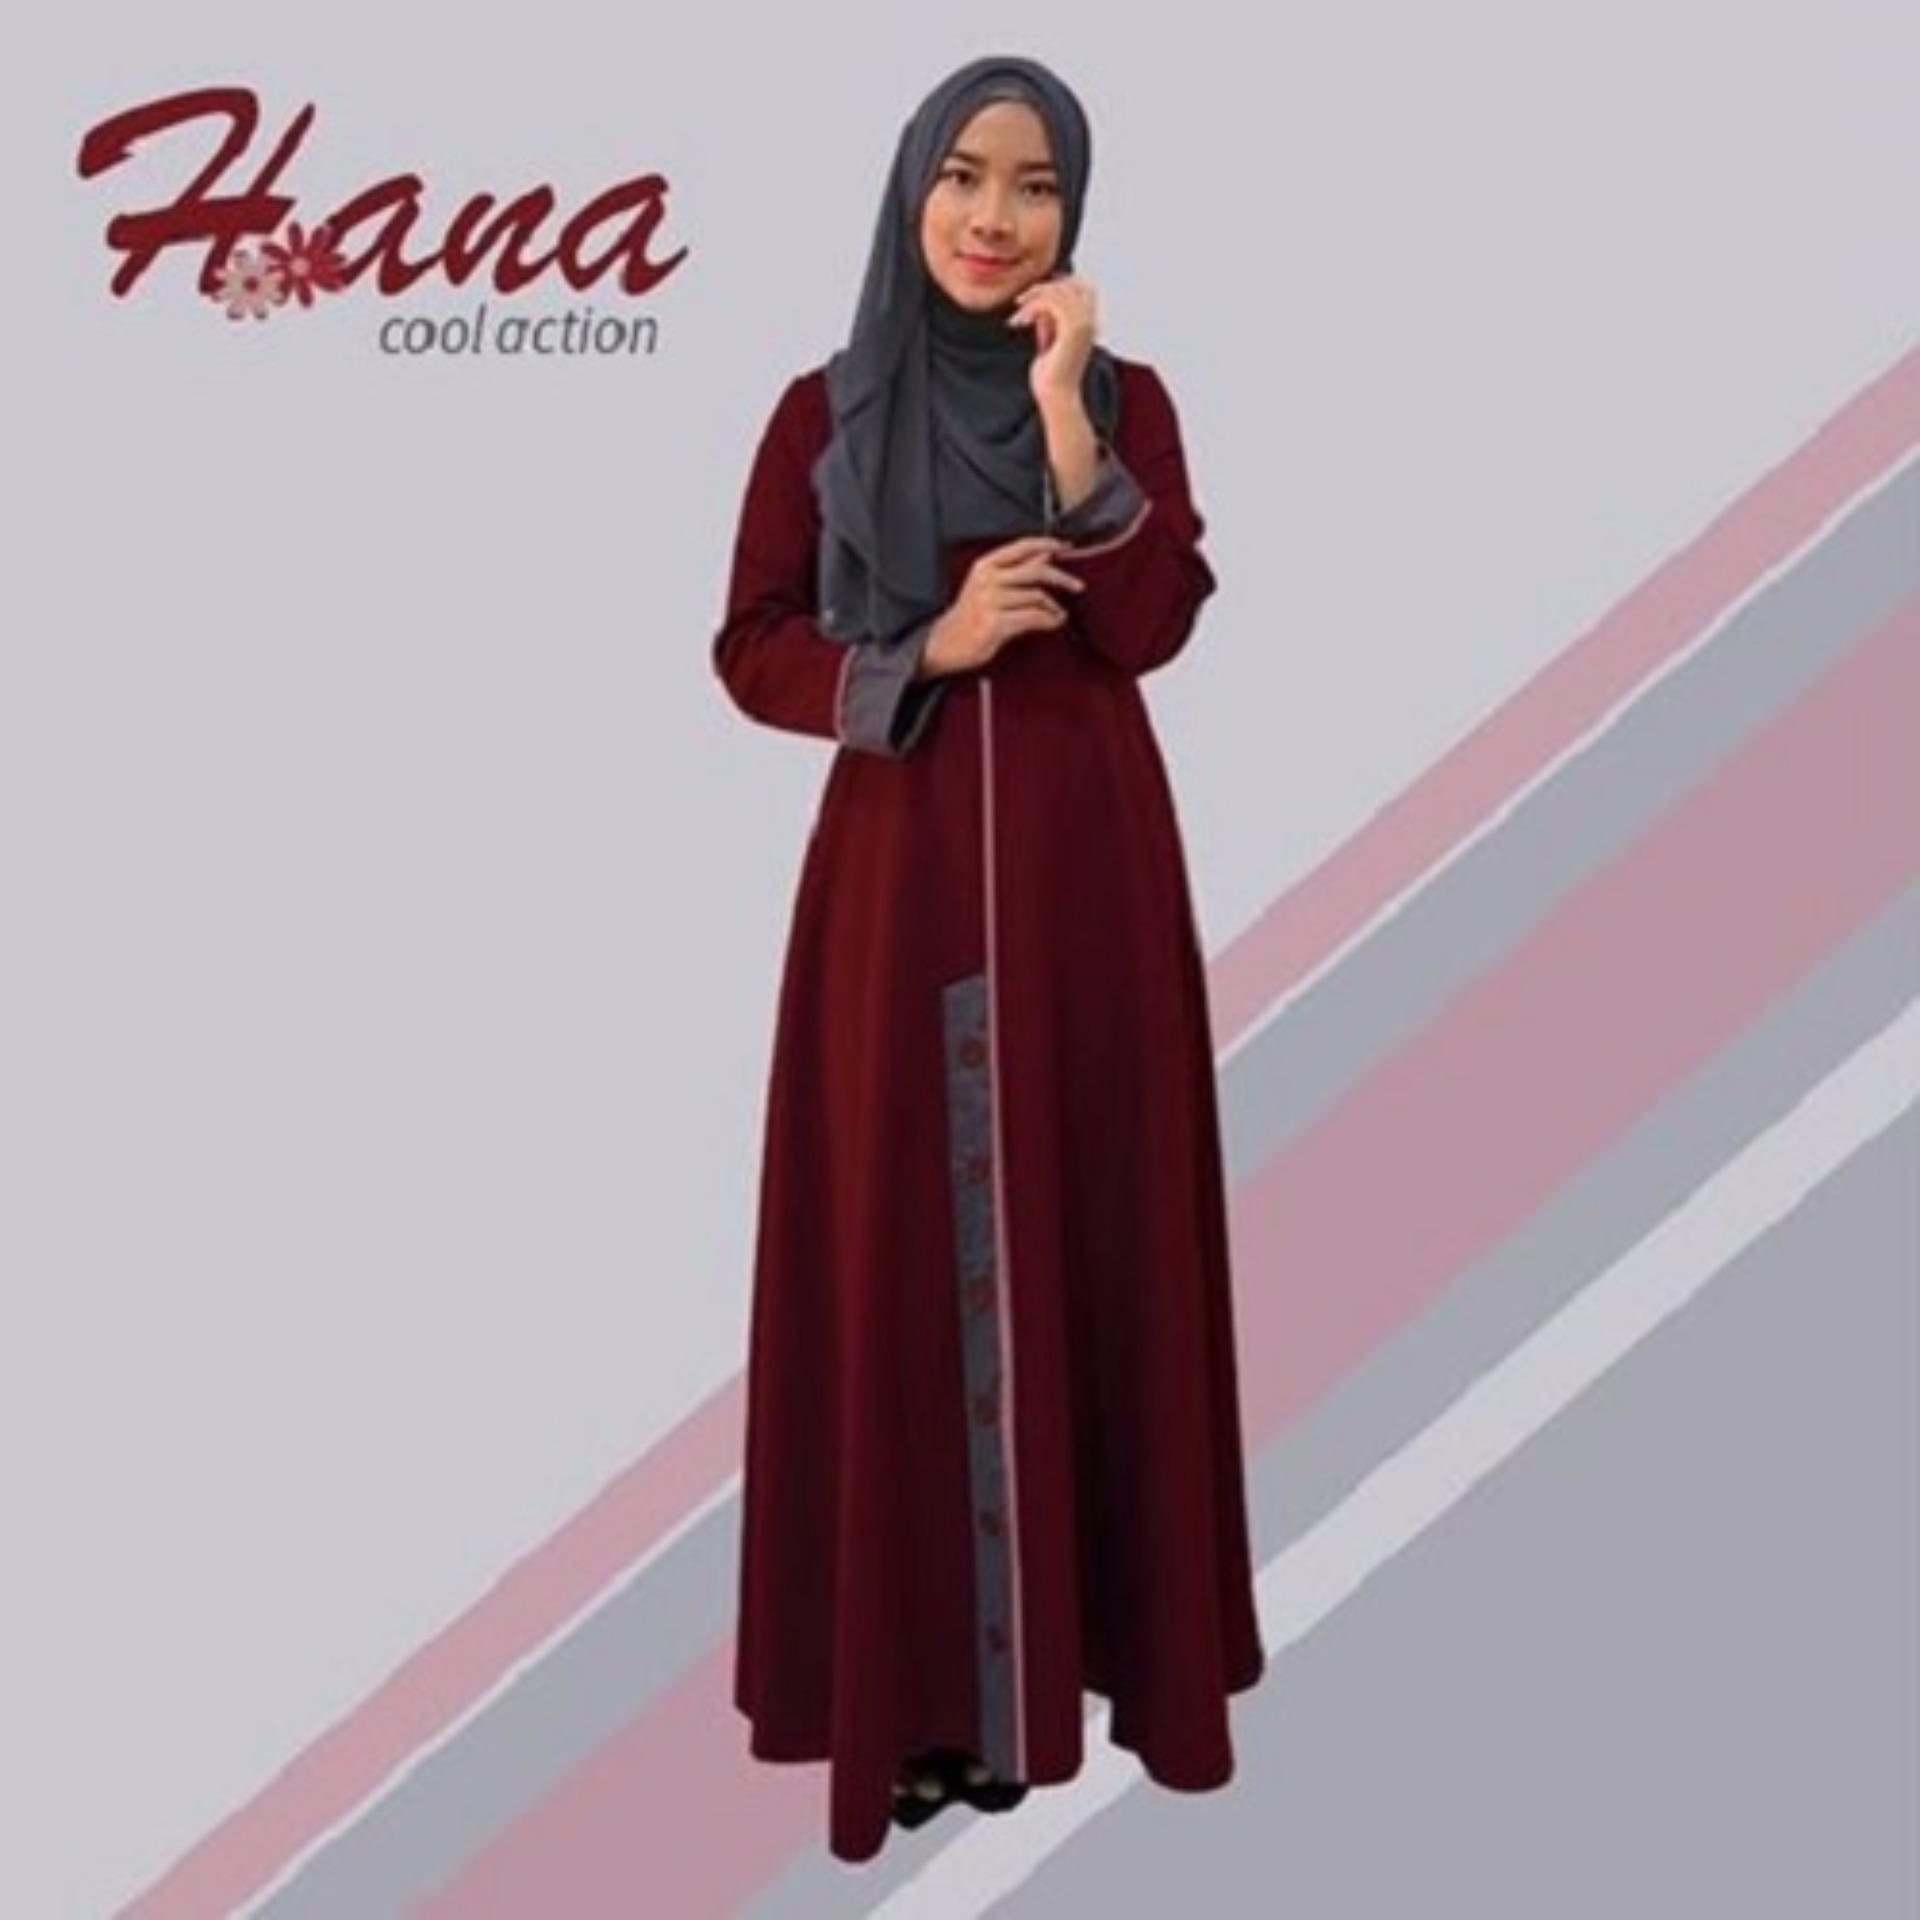 Baju OriginalHana H-01Baju Muslim Baju Hijab Baju Muslim Modern Wanita Baju  Muslim Gamis Dress 8b906c6dd9